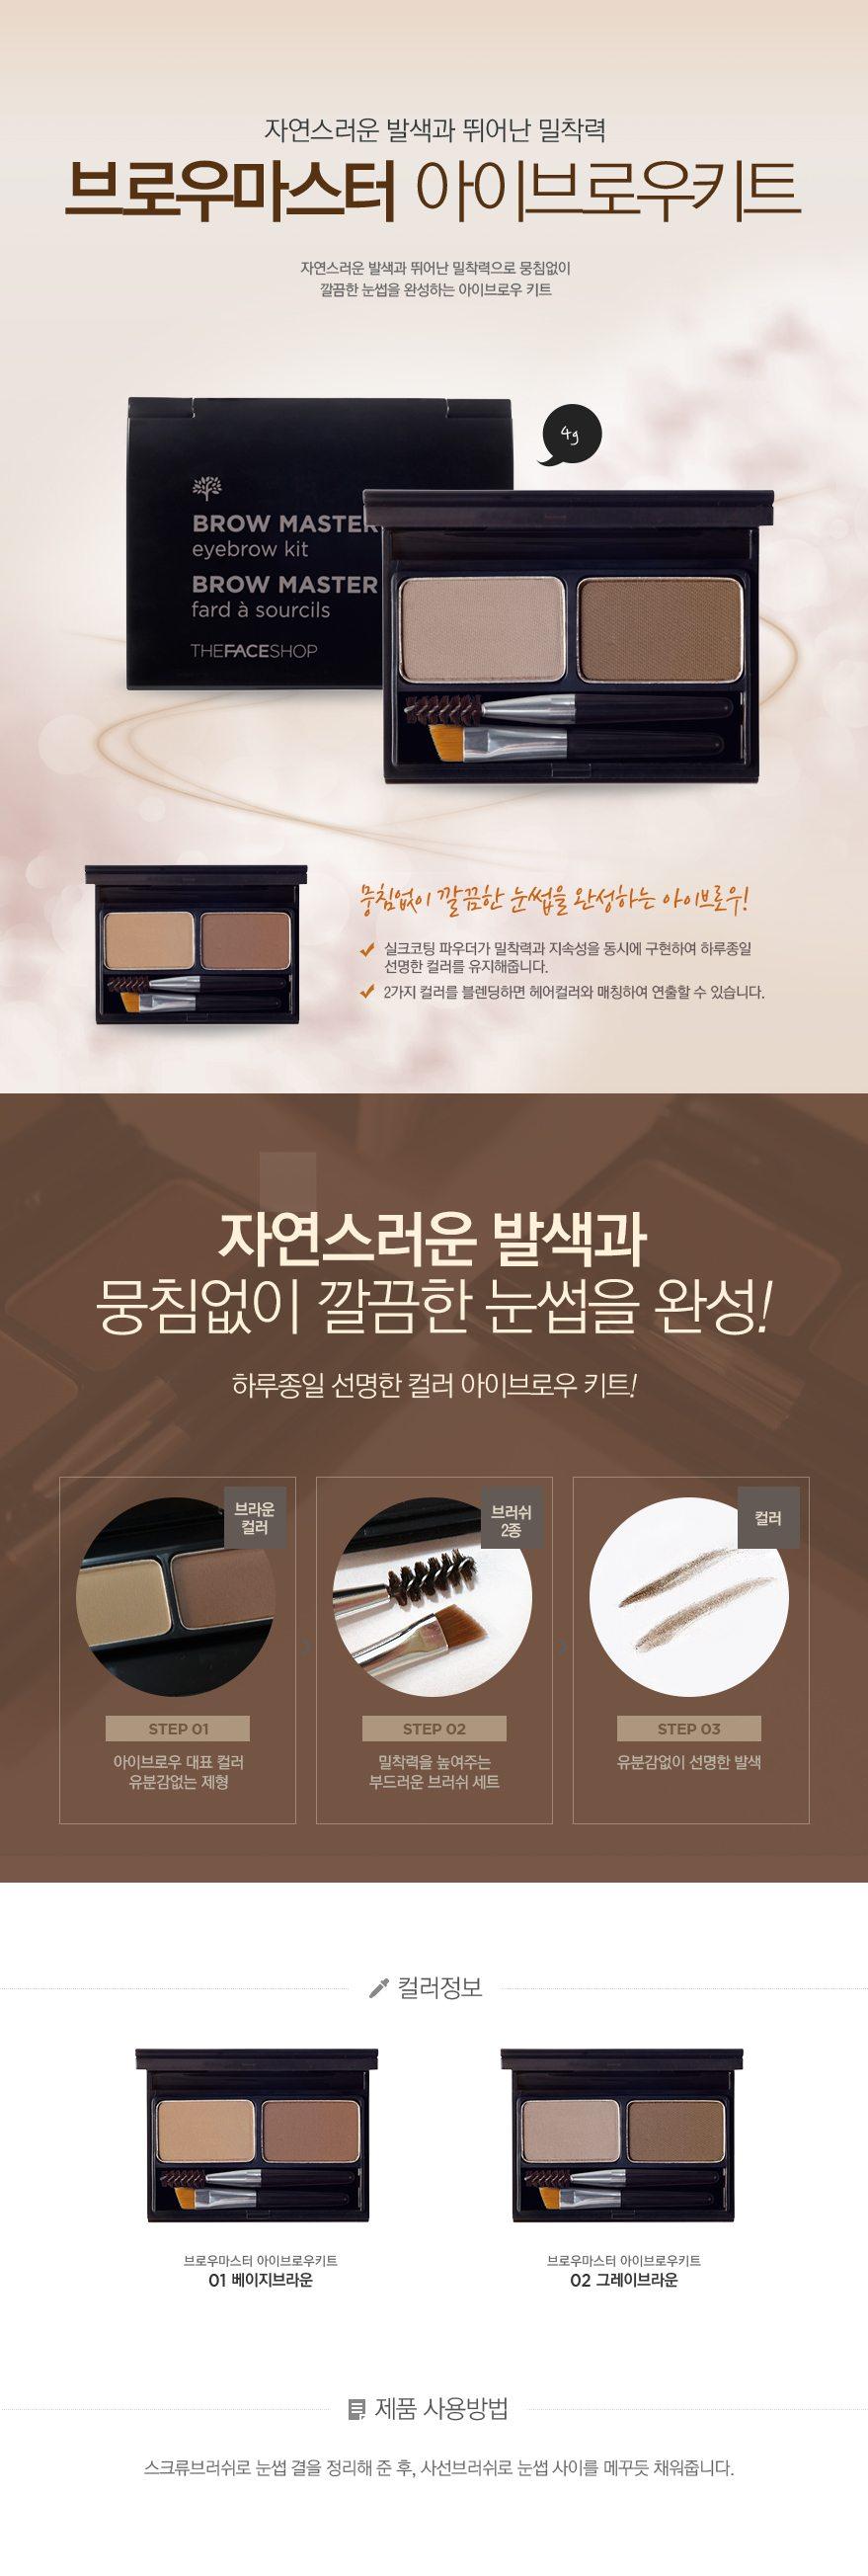 The Face Shop Brow Master Eyebrow Kit 4g malaysia singapore indonesiab